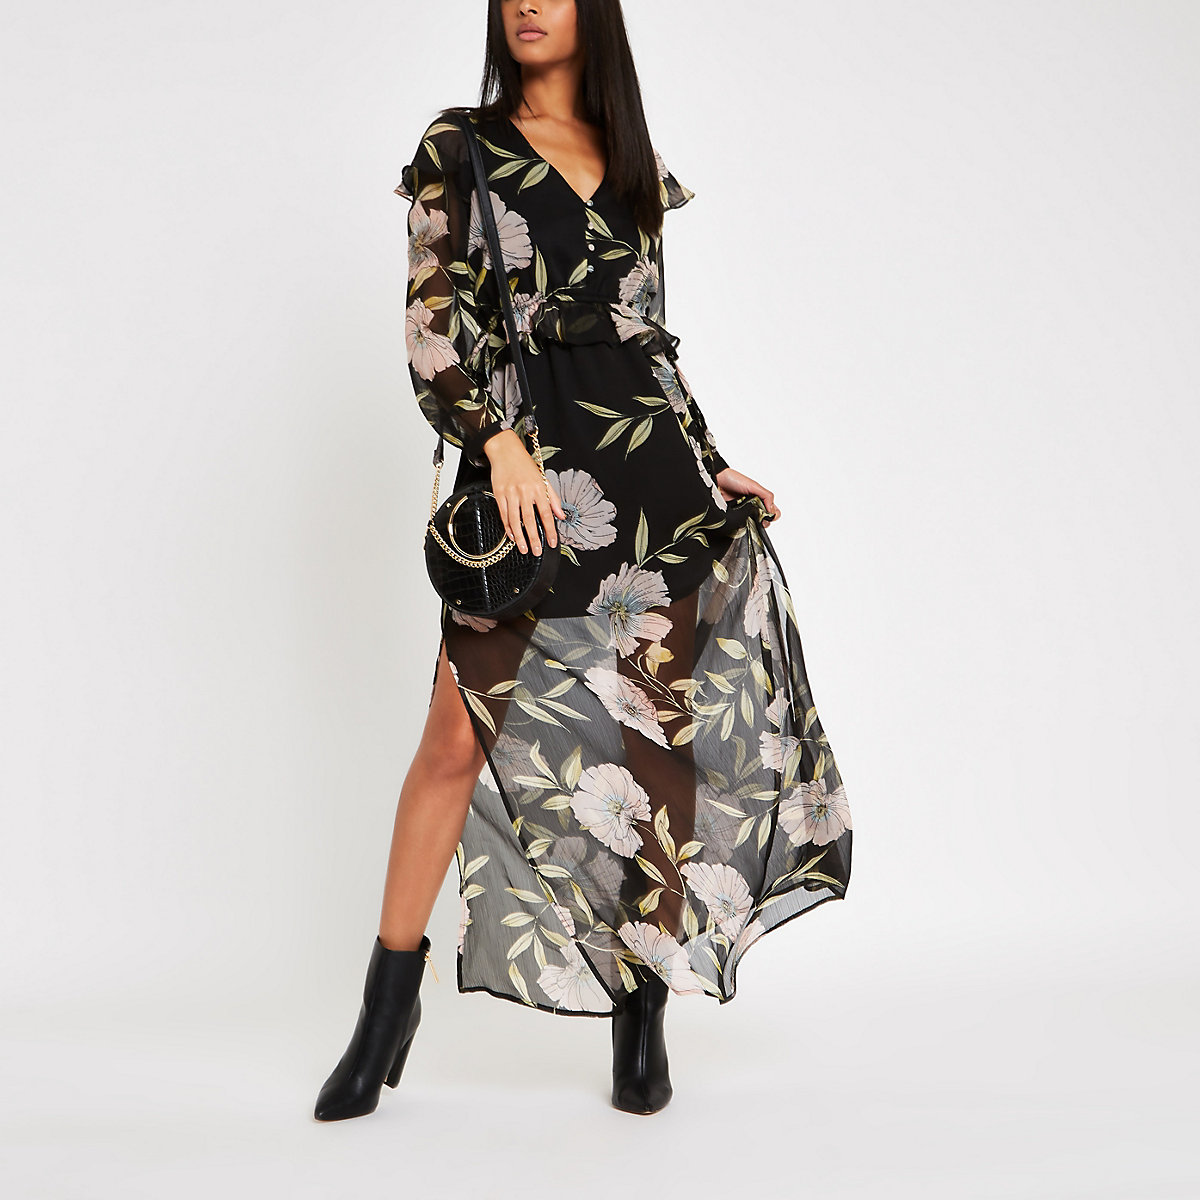 Black floral frill maxi dress